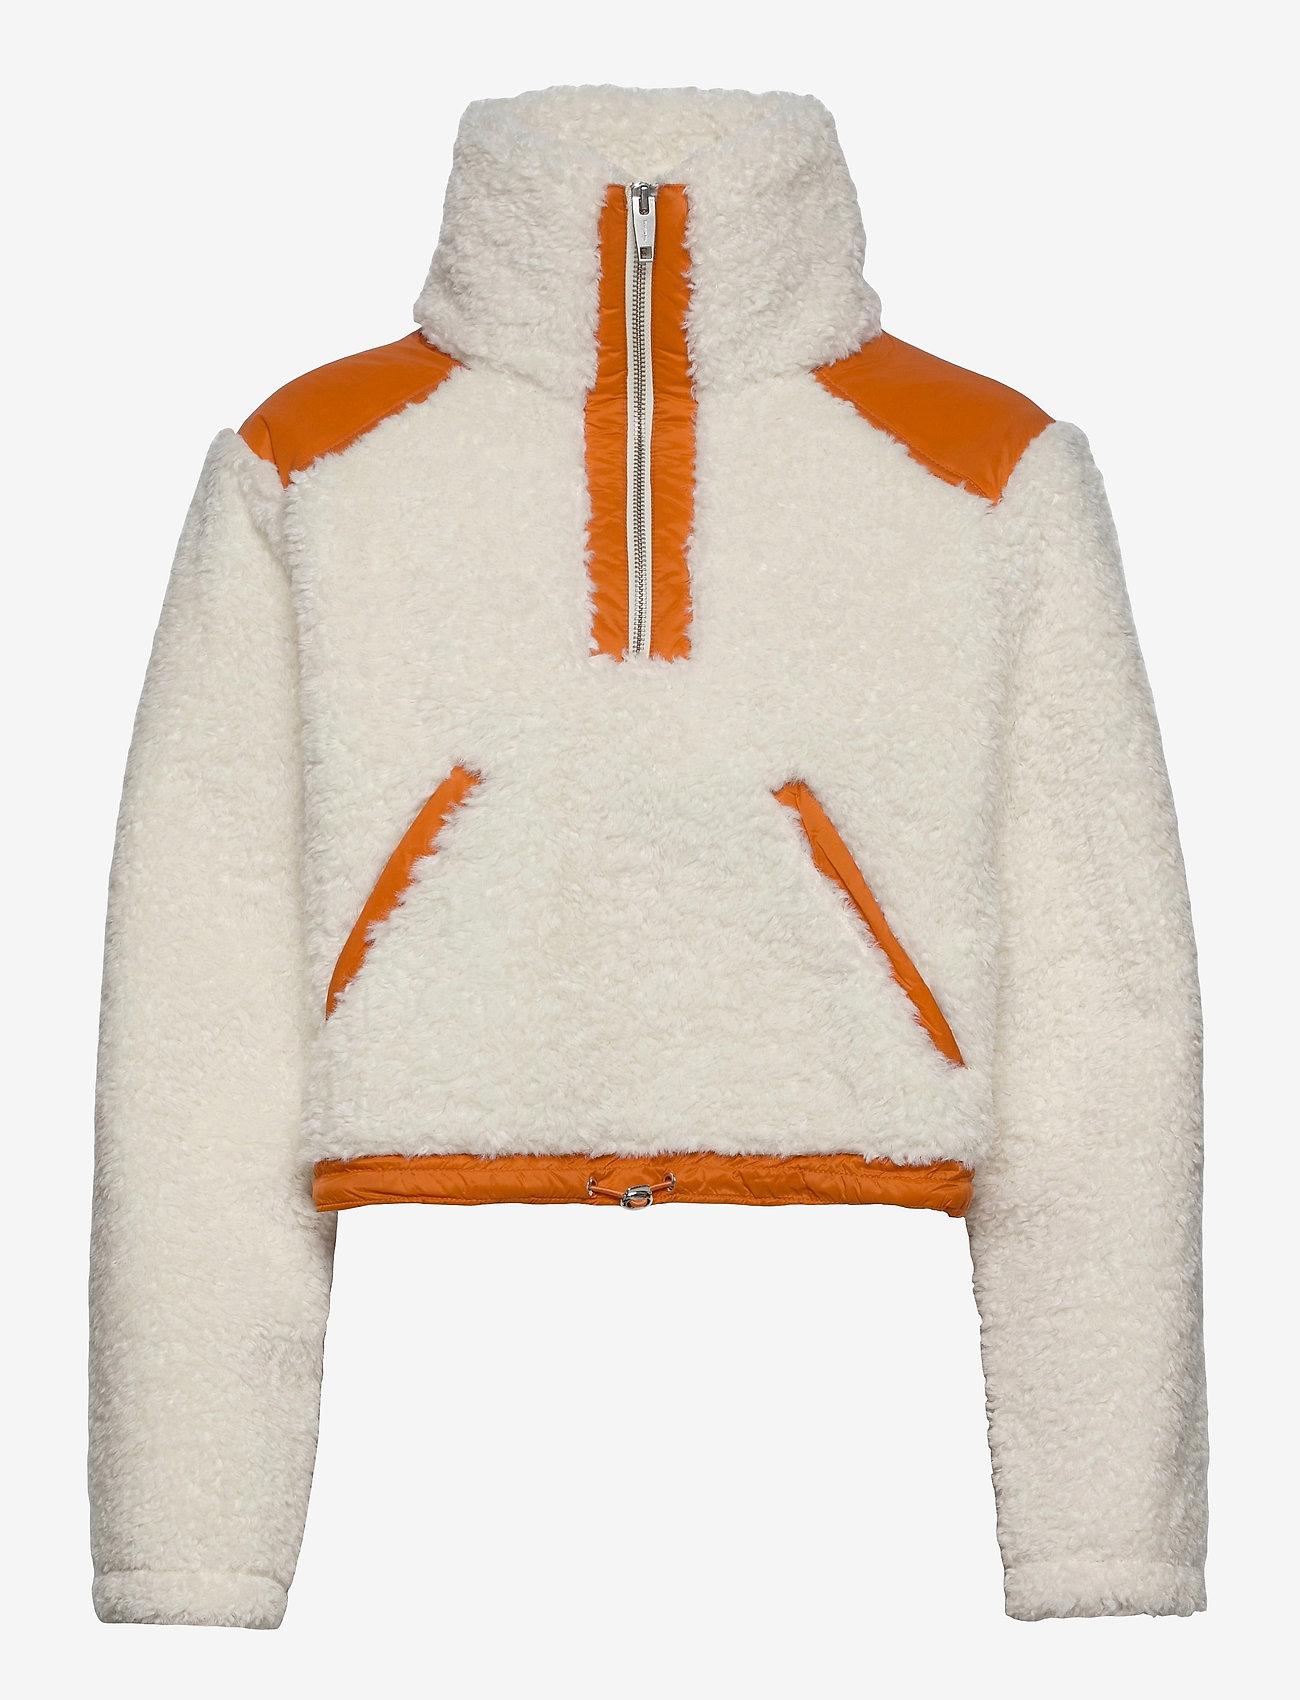 The Kooples - SWEAT - sweatshirts en hoodies - orange ecru - 0